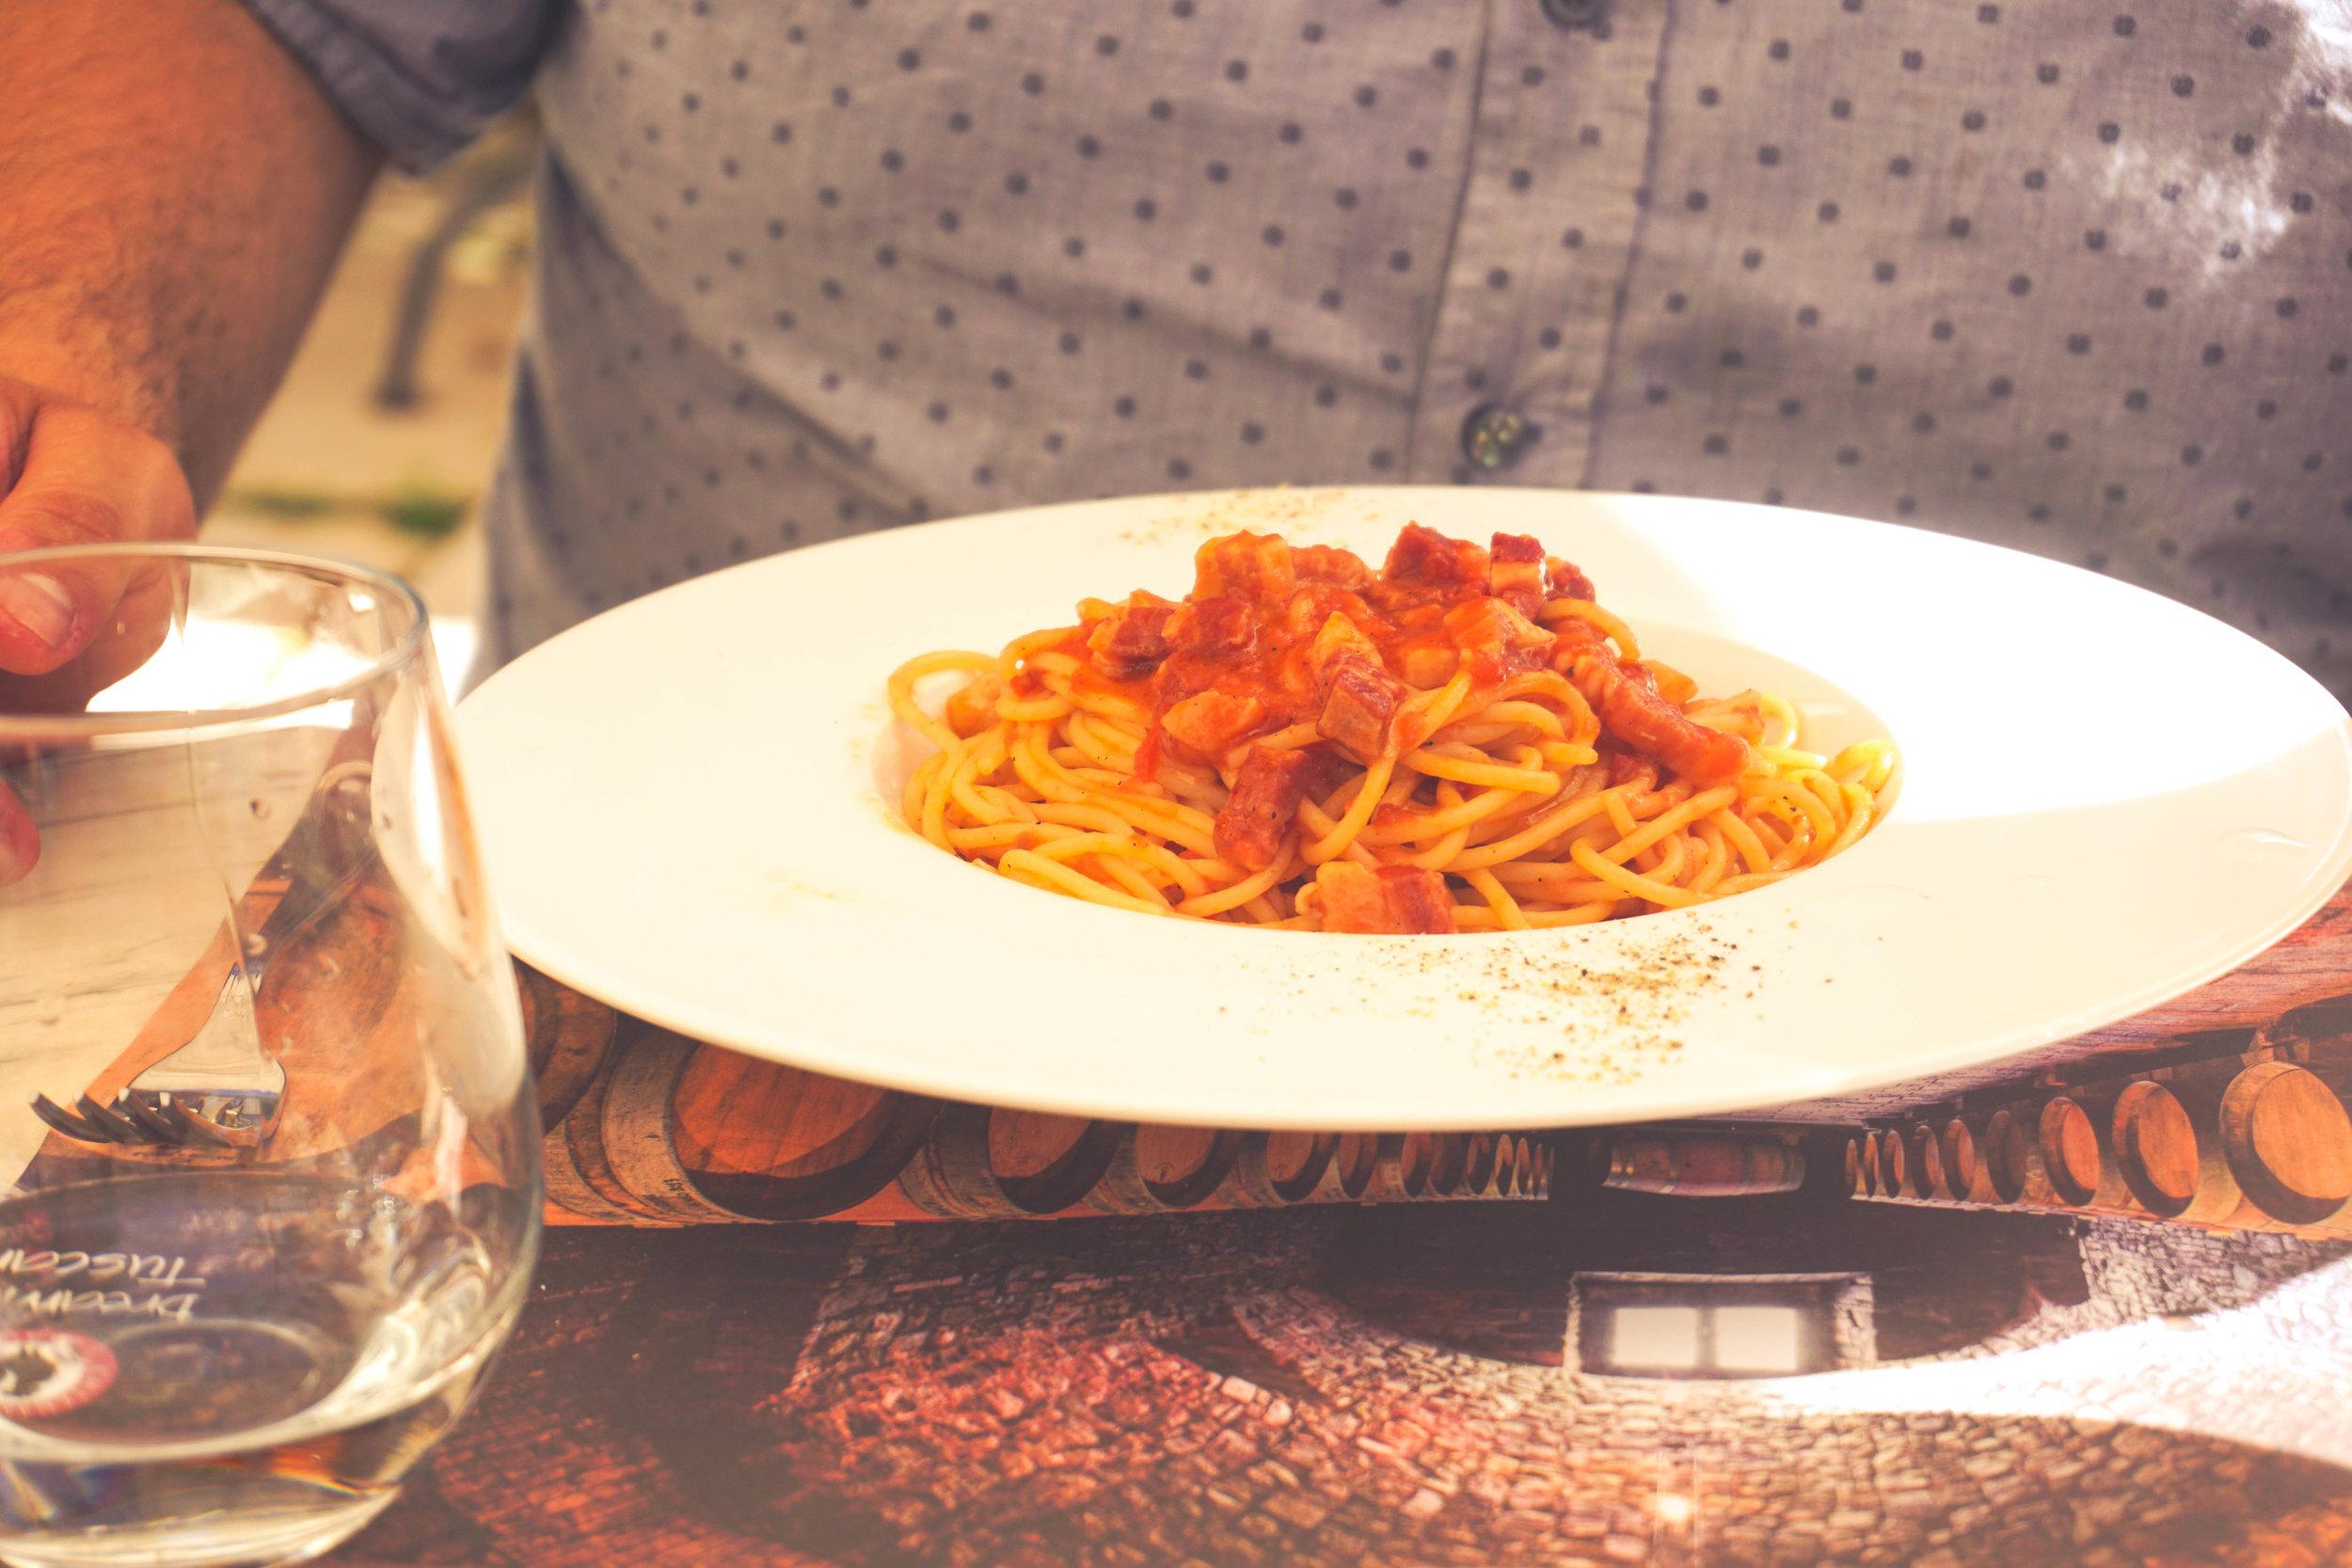 plate of pasta.jpg